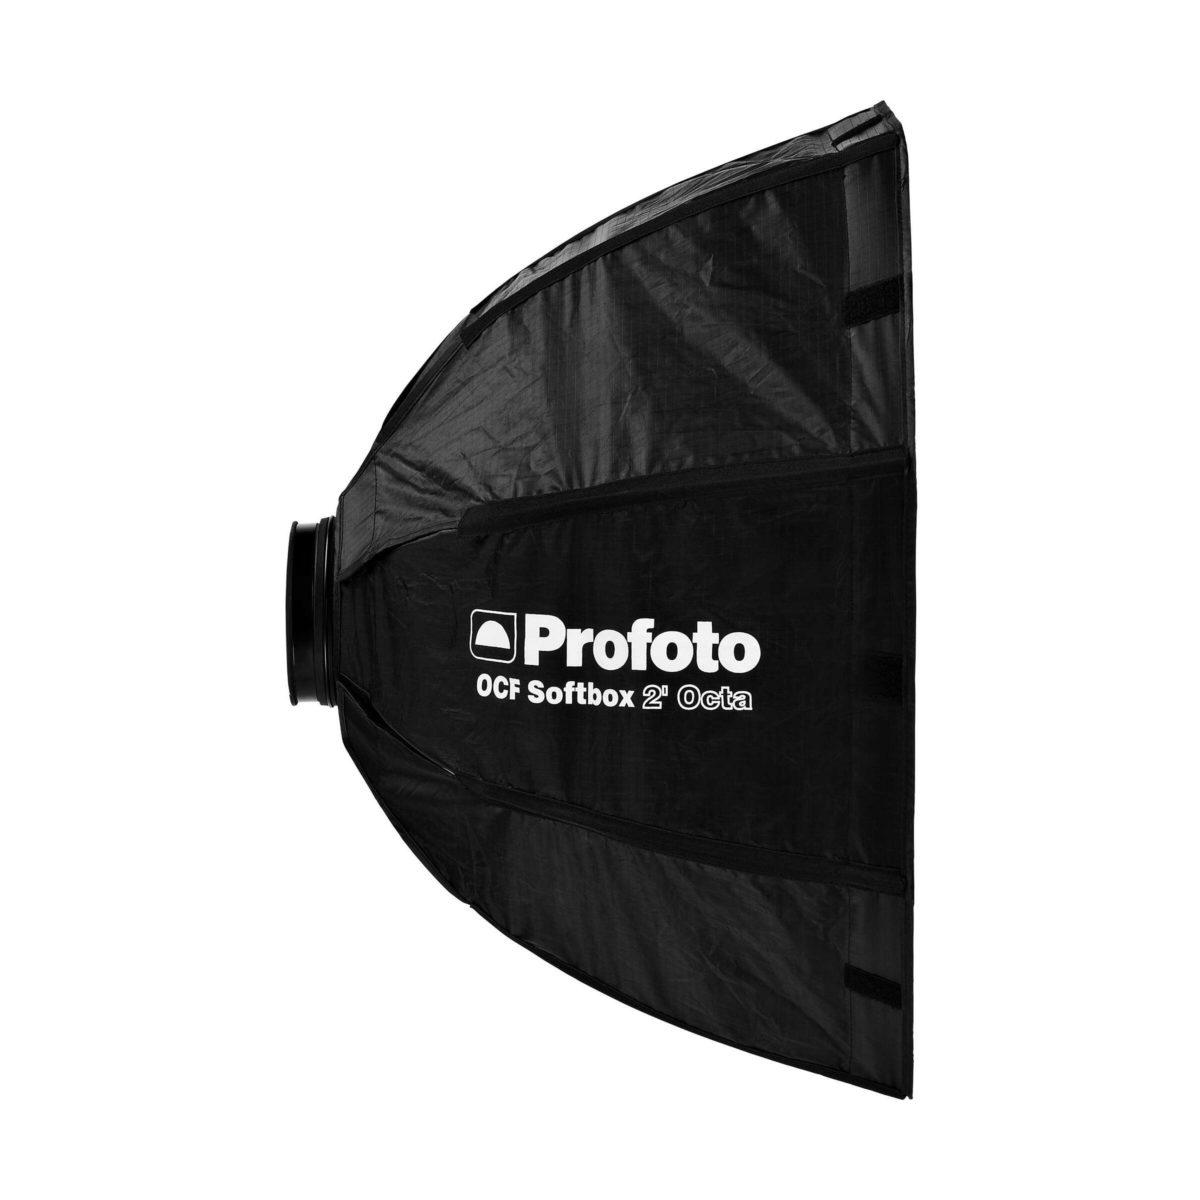 profoto_ocf_softbox_2_octa_01